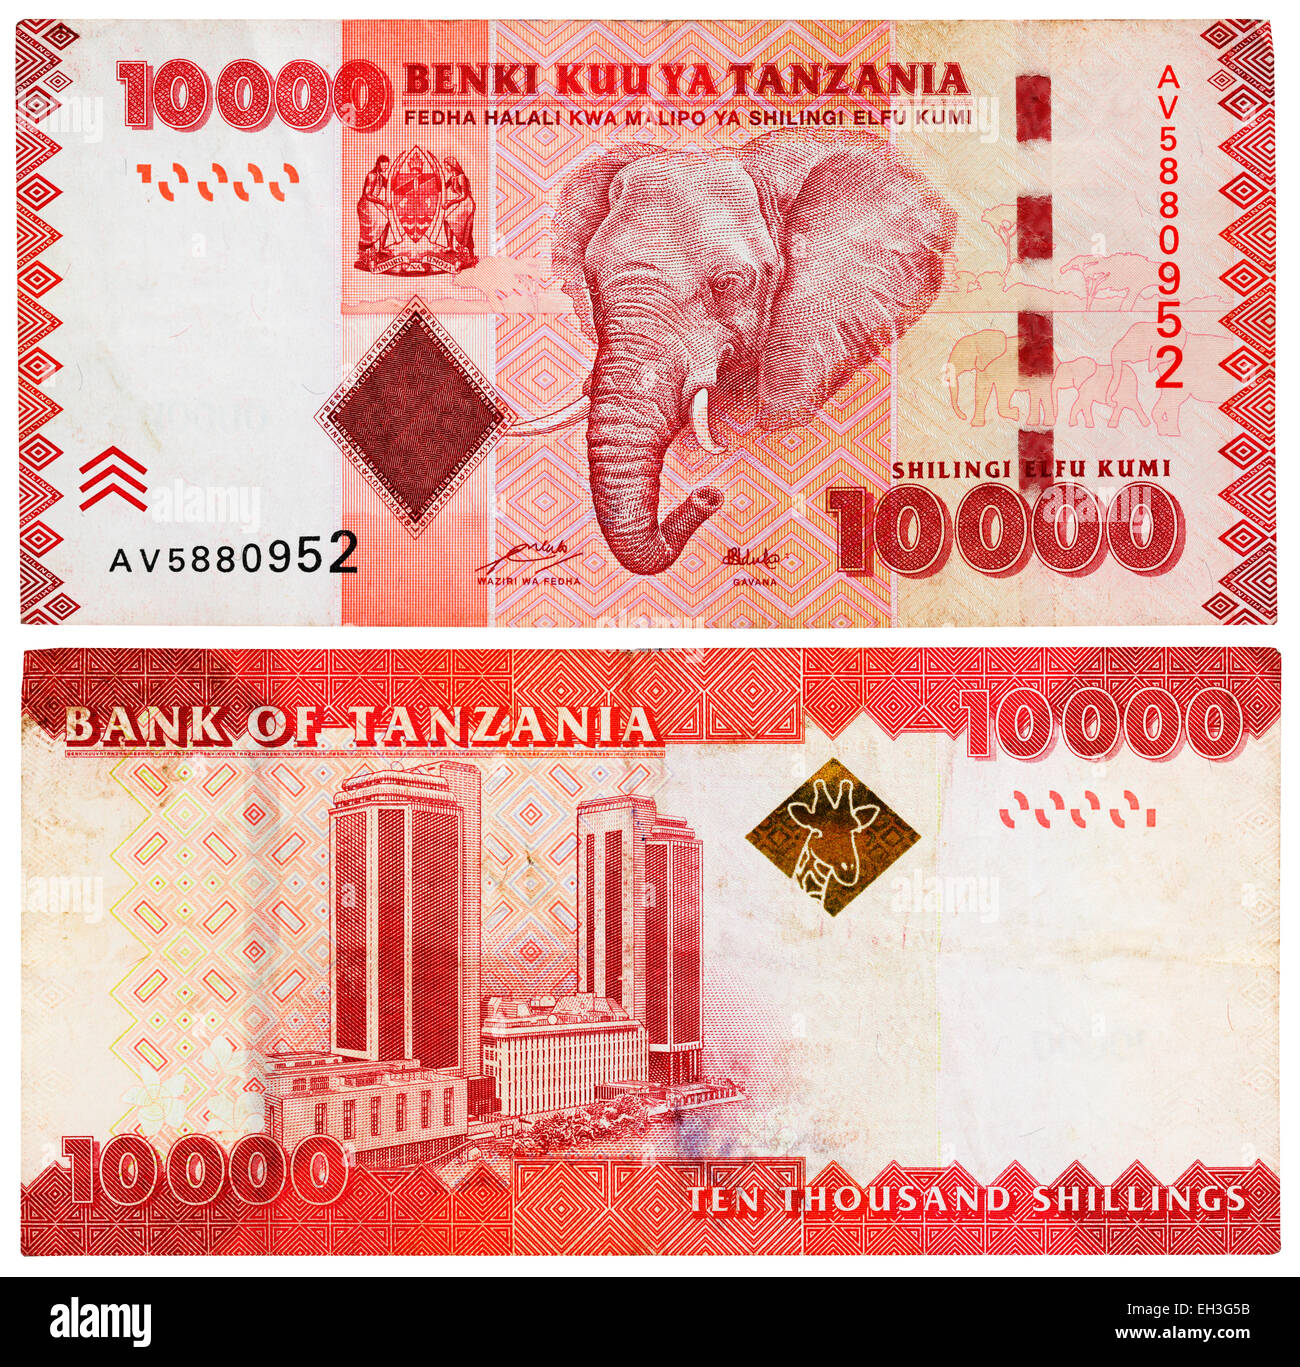 10000 shillings banknote, Elephant, building in Dar es Salaam, Tanzania, 2010 - Stock Image